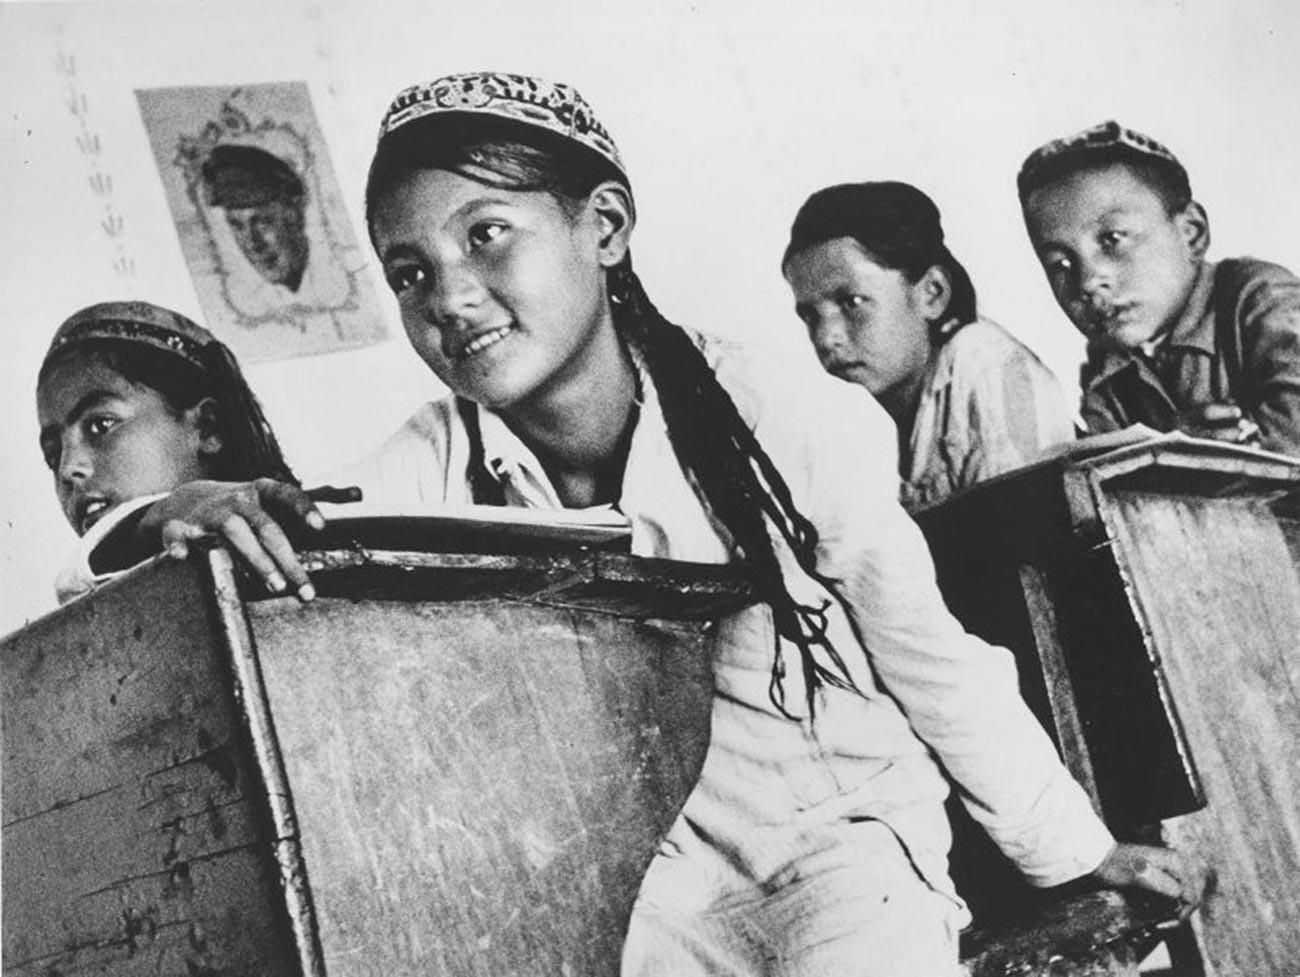 Suasana di sekolah, Uzbekistan, 1930-an.